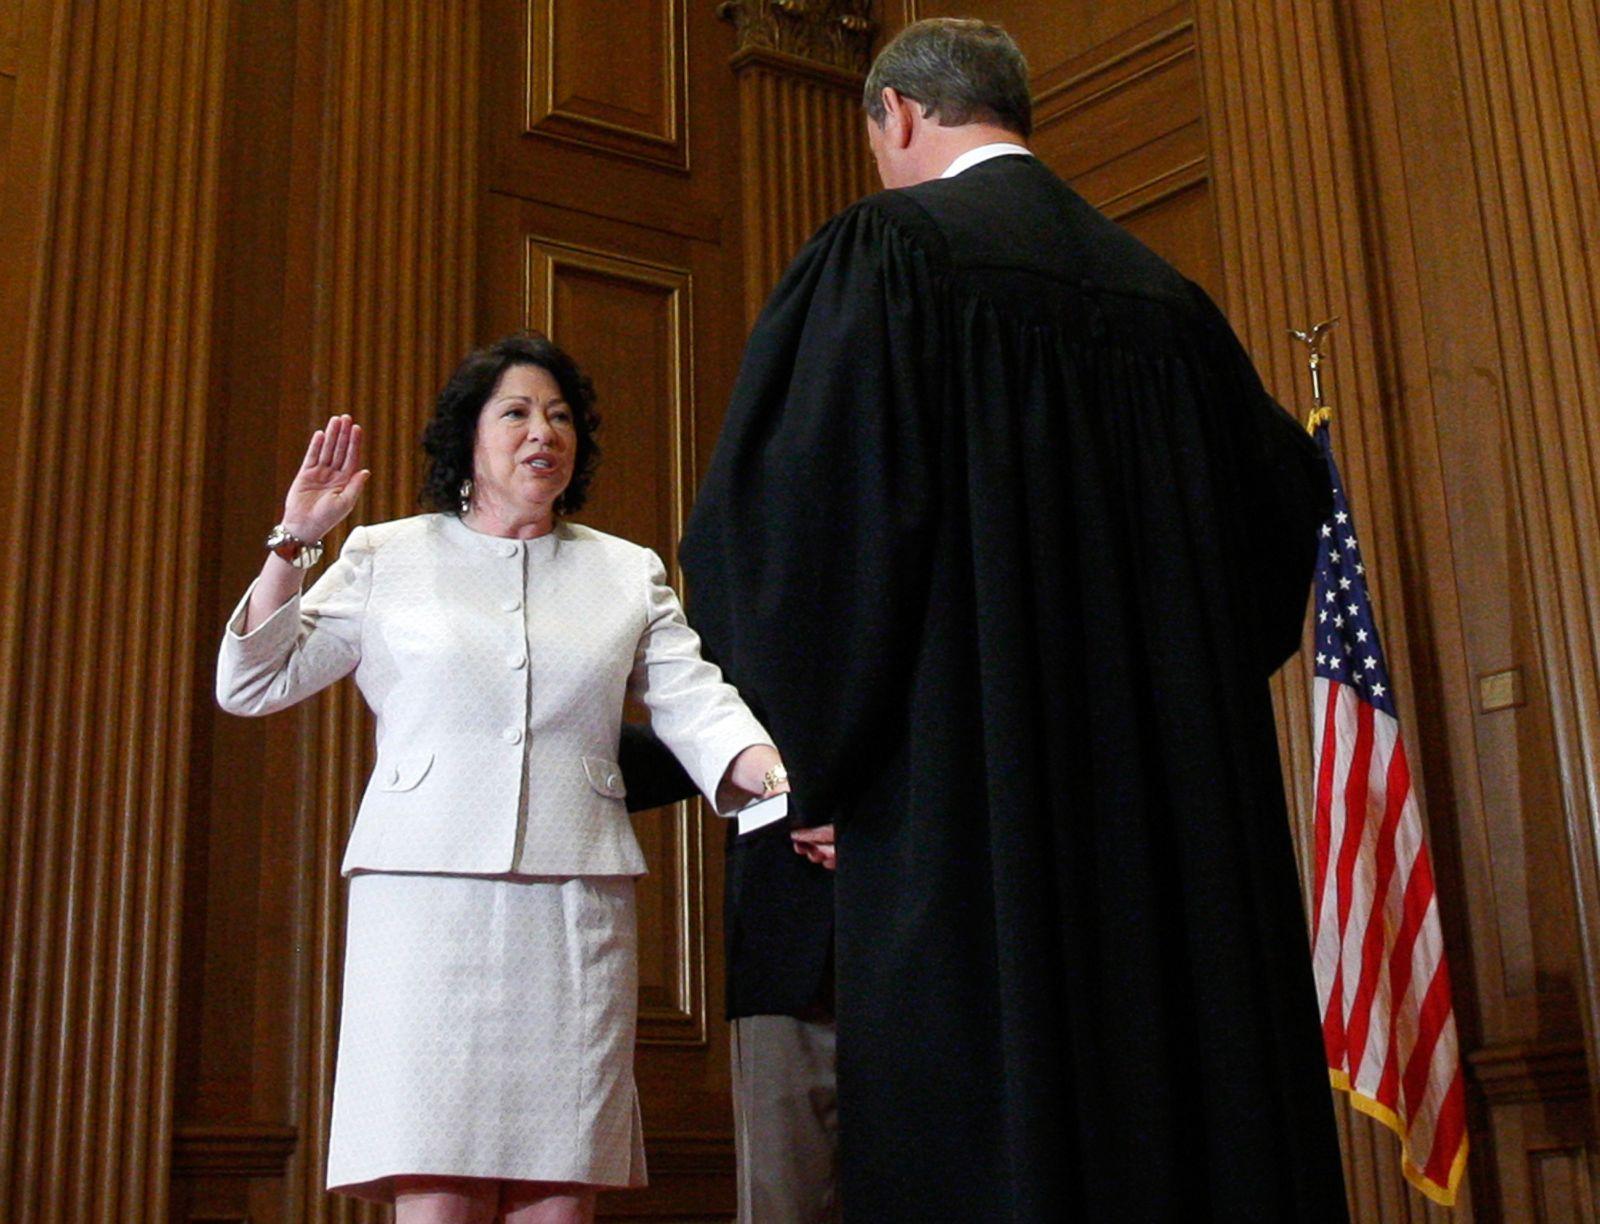 Supreme court avoids lesbian wedding cake dispute, sending case to lower court